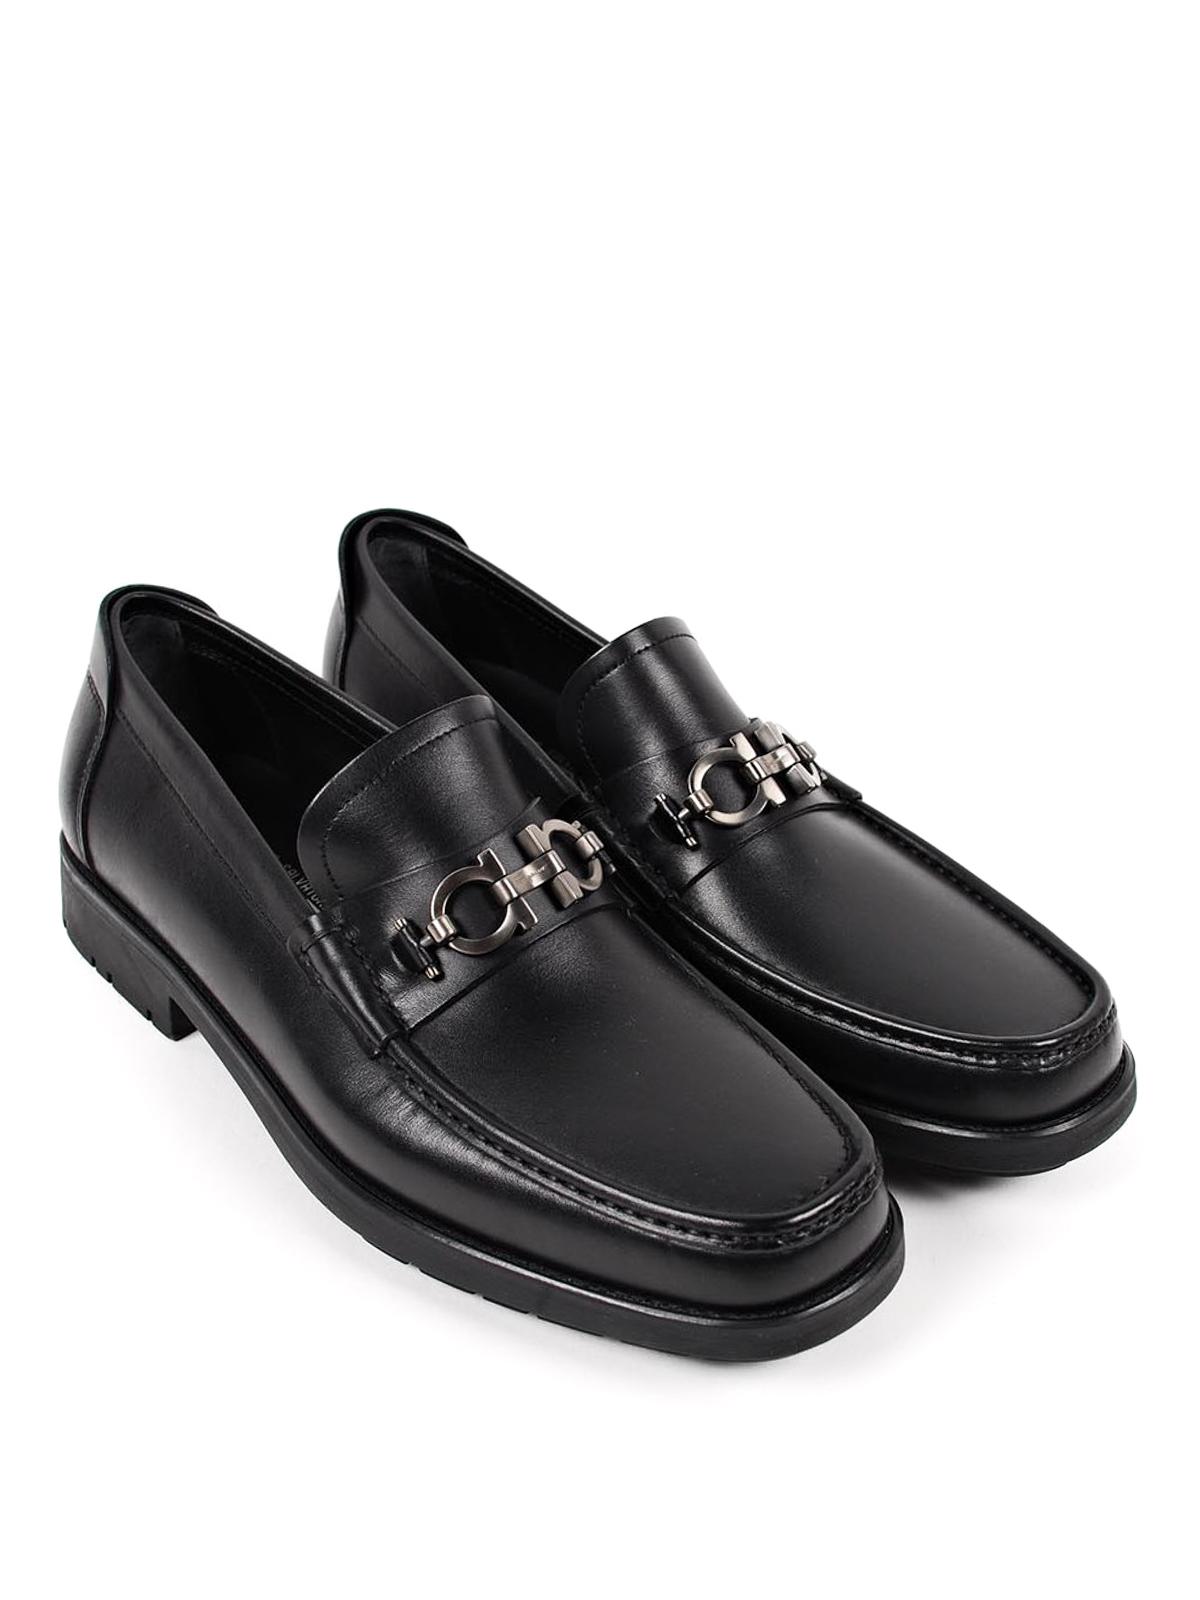 Salvatore FerragamoGancio Bit loafers OuOuTTrjjq